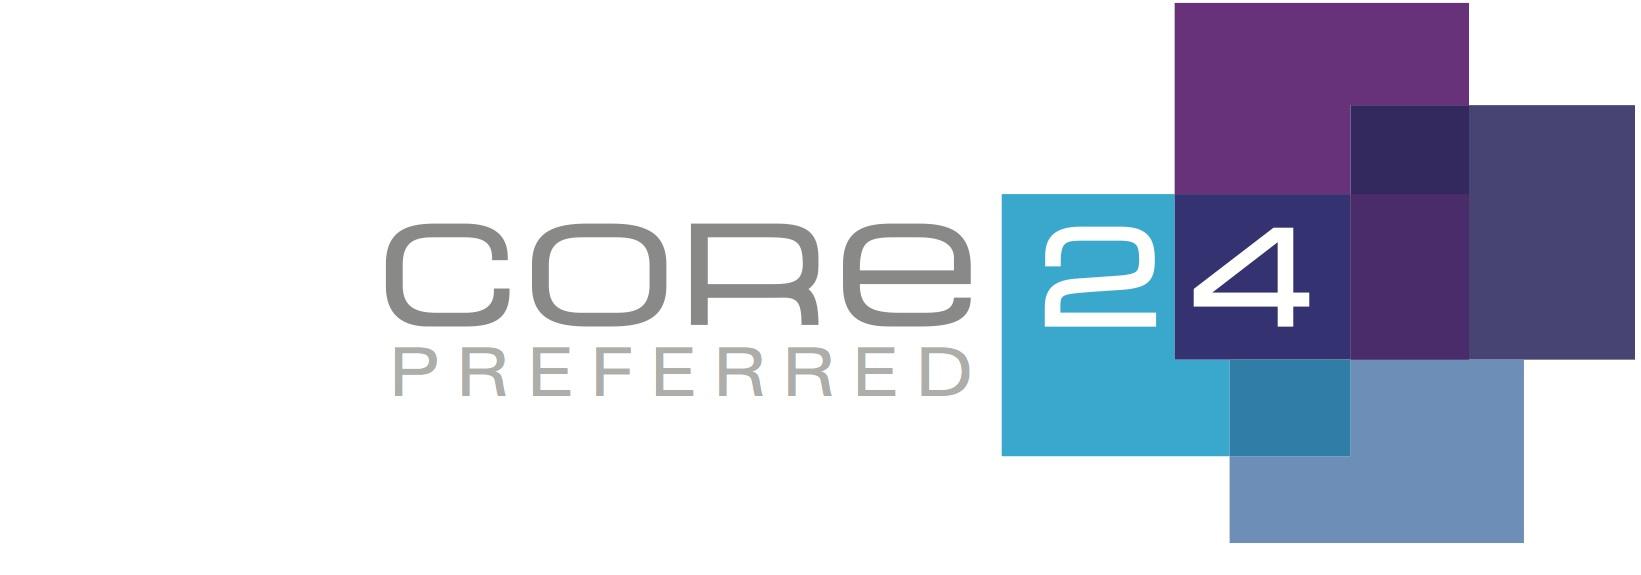 Premier business resource platform for mid-market companies